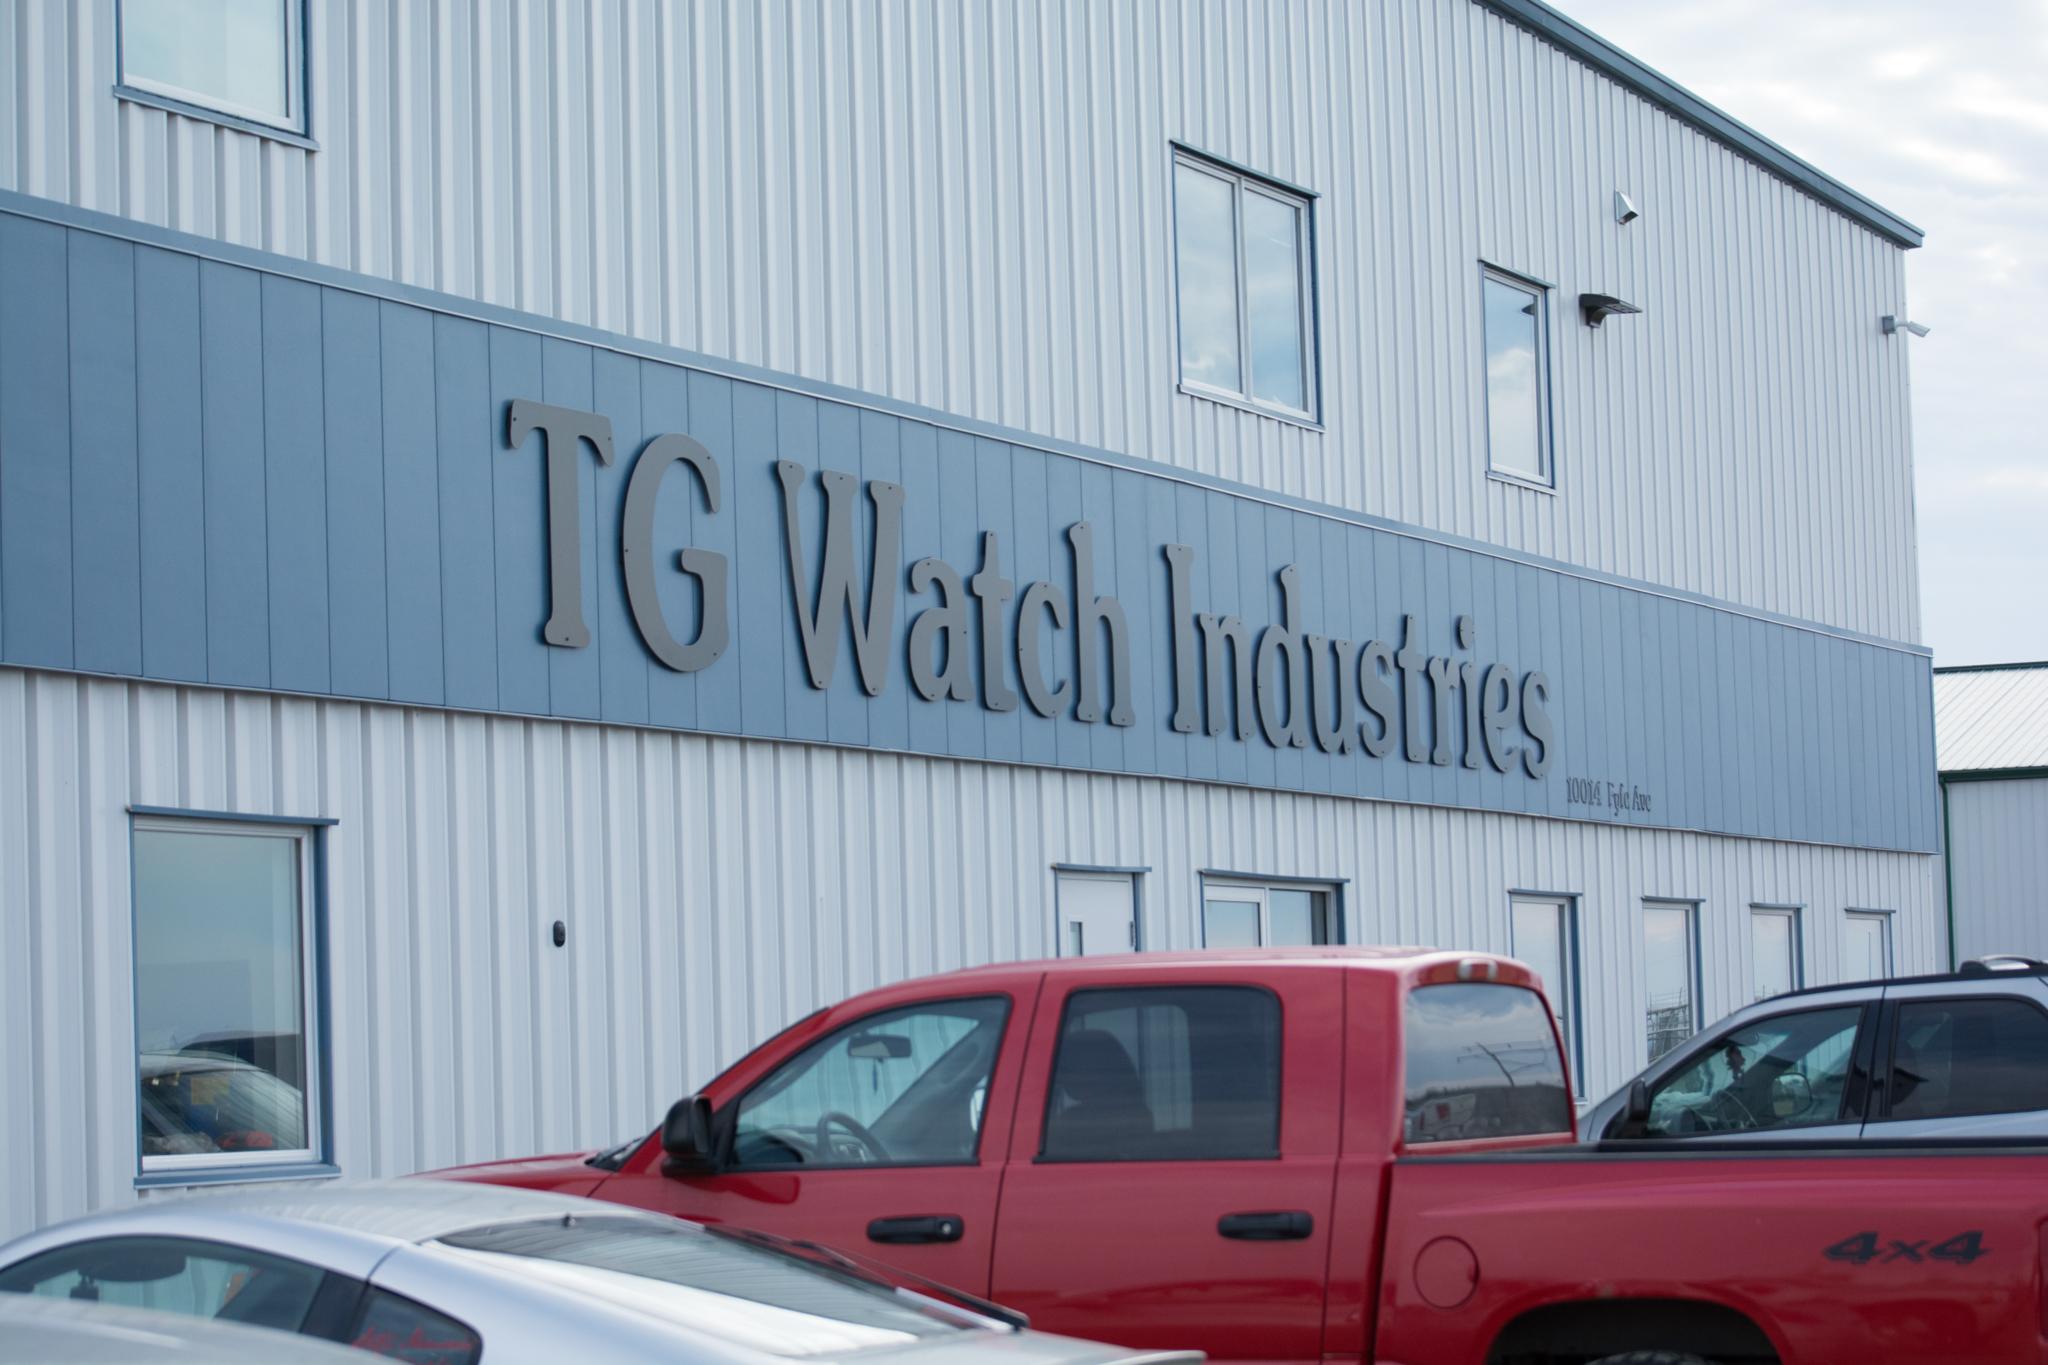 TG Watch Industries